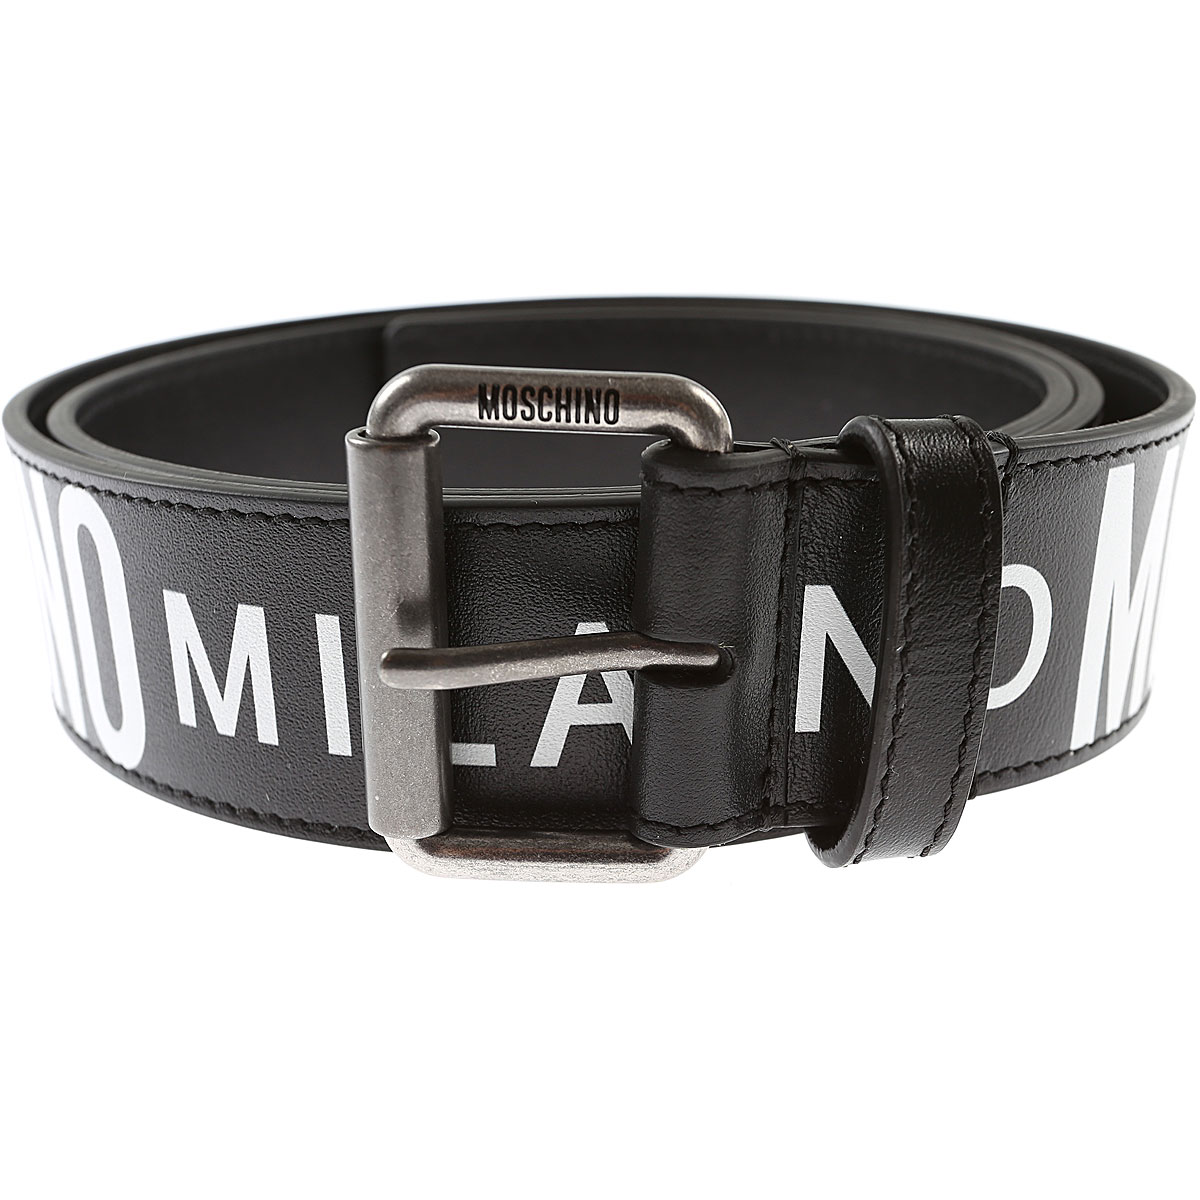 Moschino Mens Belts, Black, Leather, 2017, 48 (90 - 95 cm) 50 (100 - 105 cm) 52 (110 - 115 cm) 54 (120 cm)